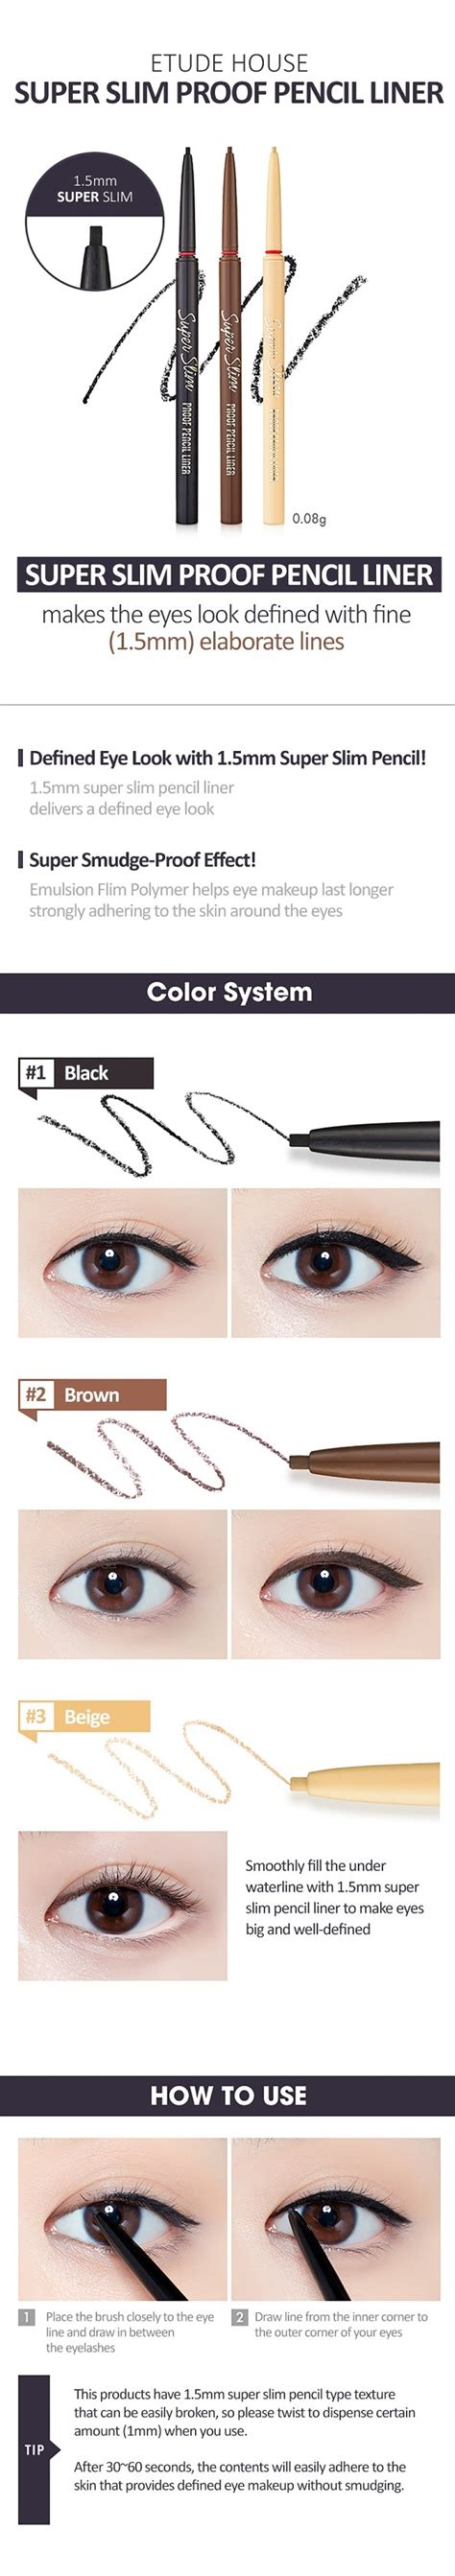 Eyeliner Etude etude house slim pencil liner